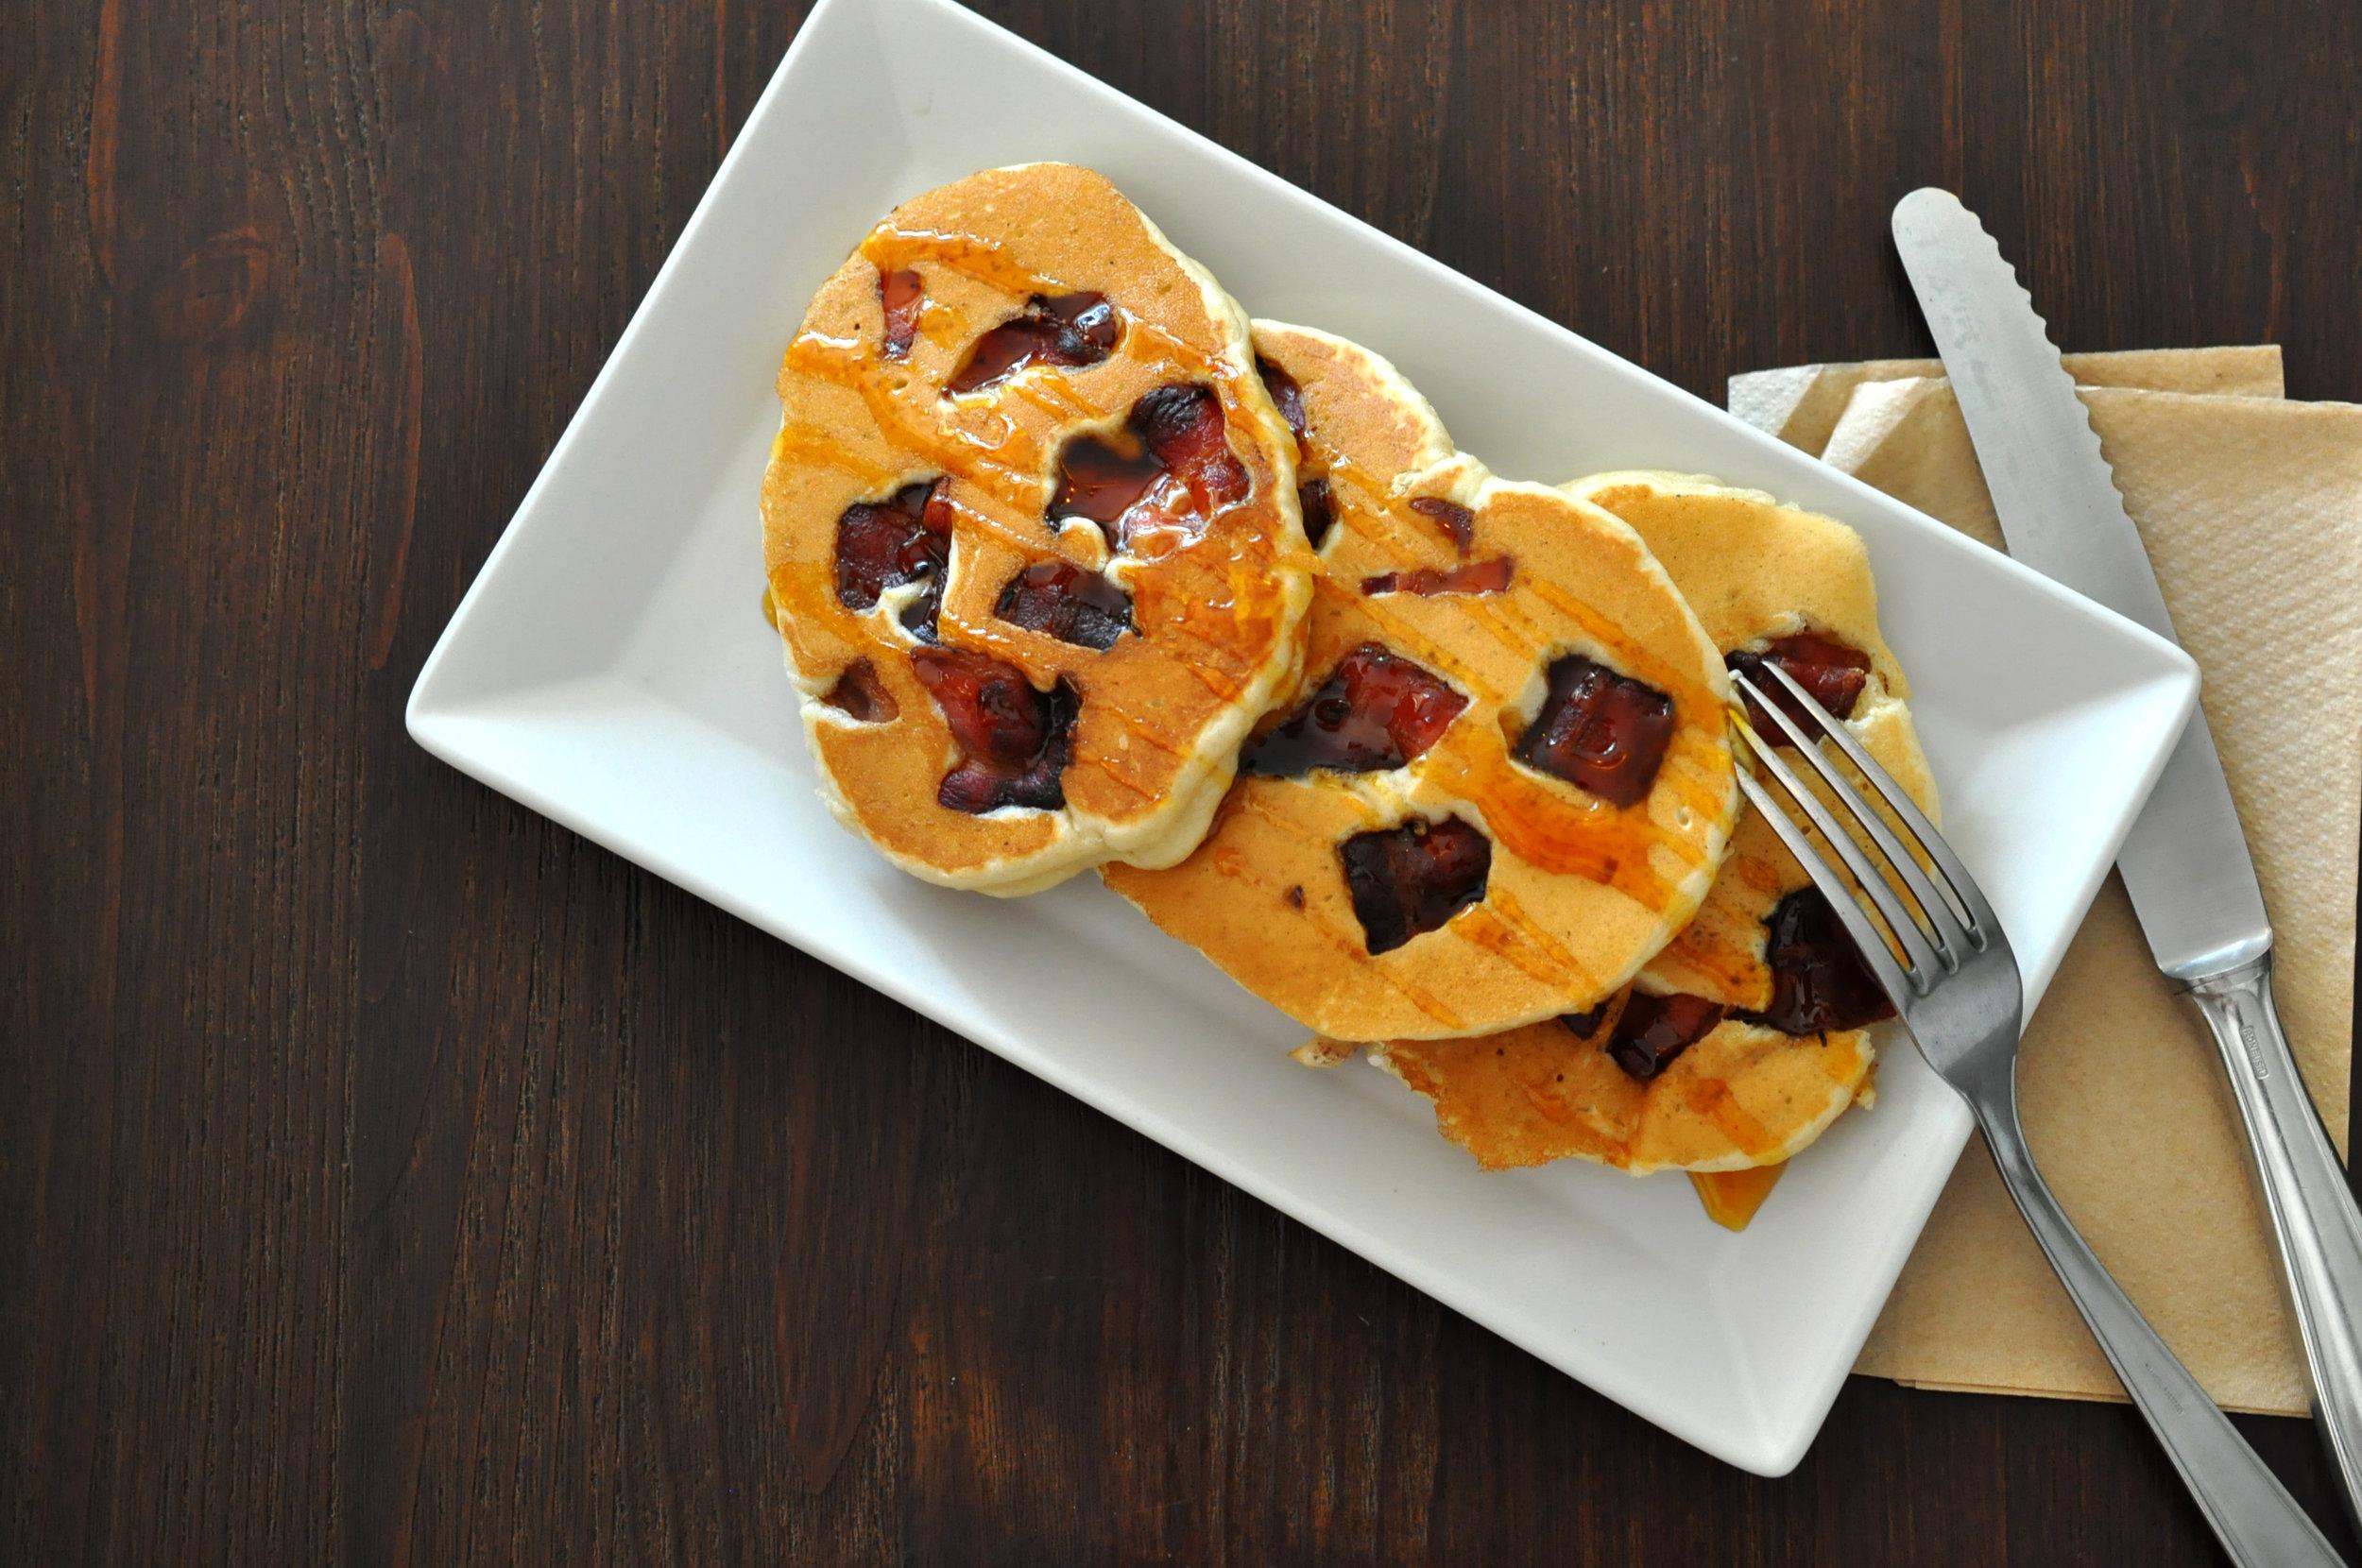 Baconpancakes.jpg